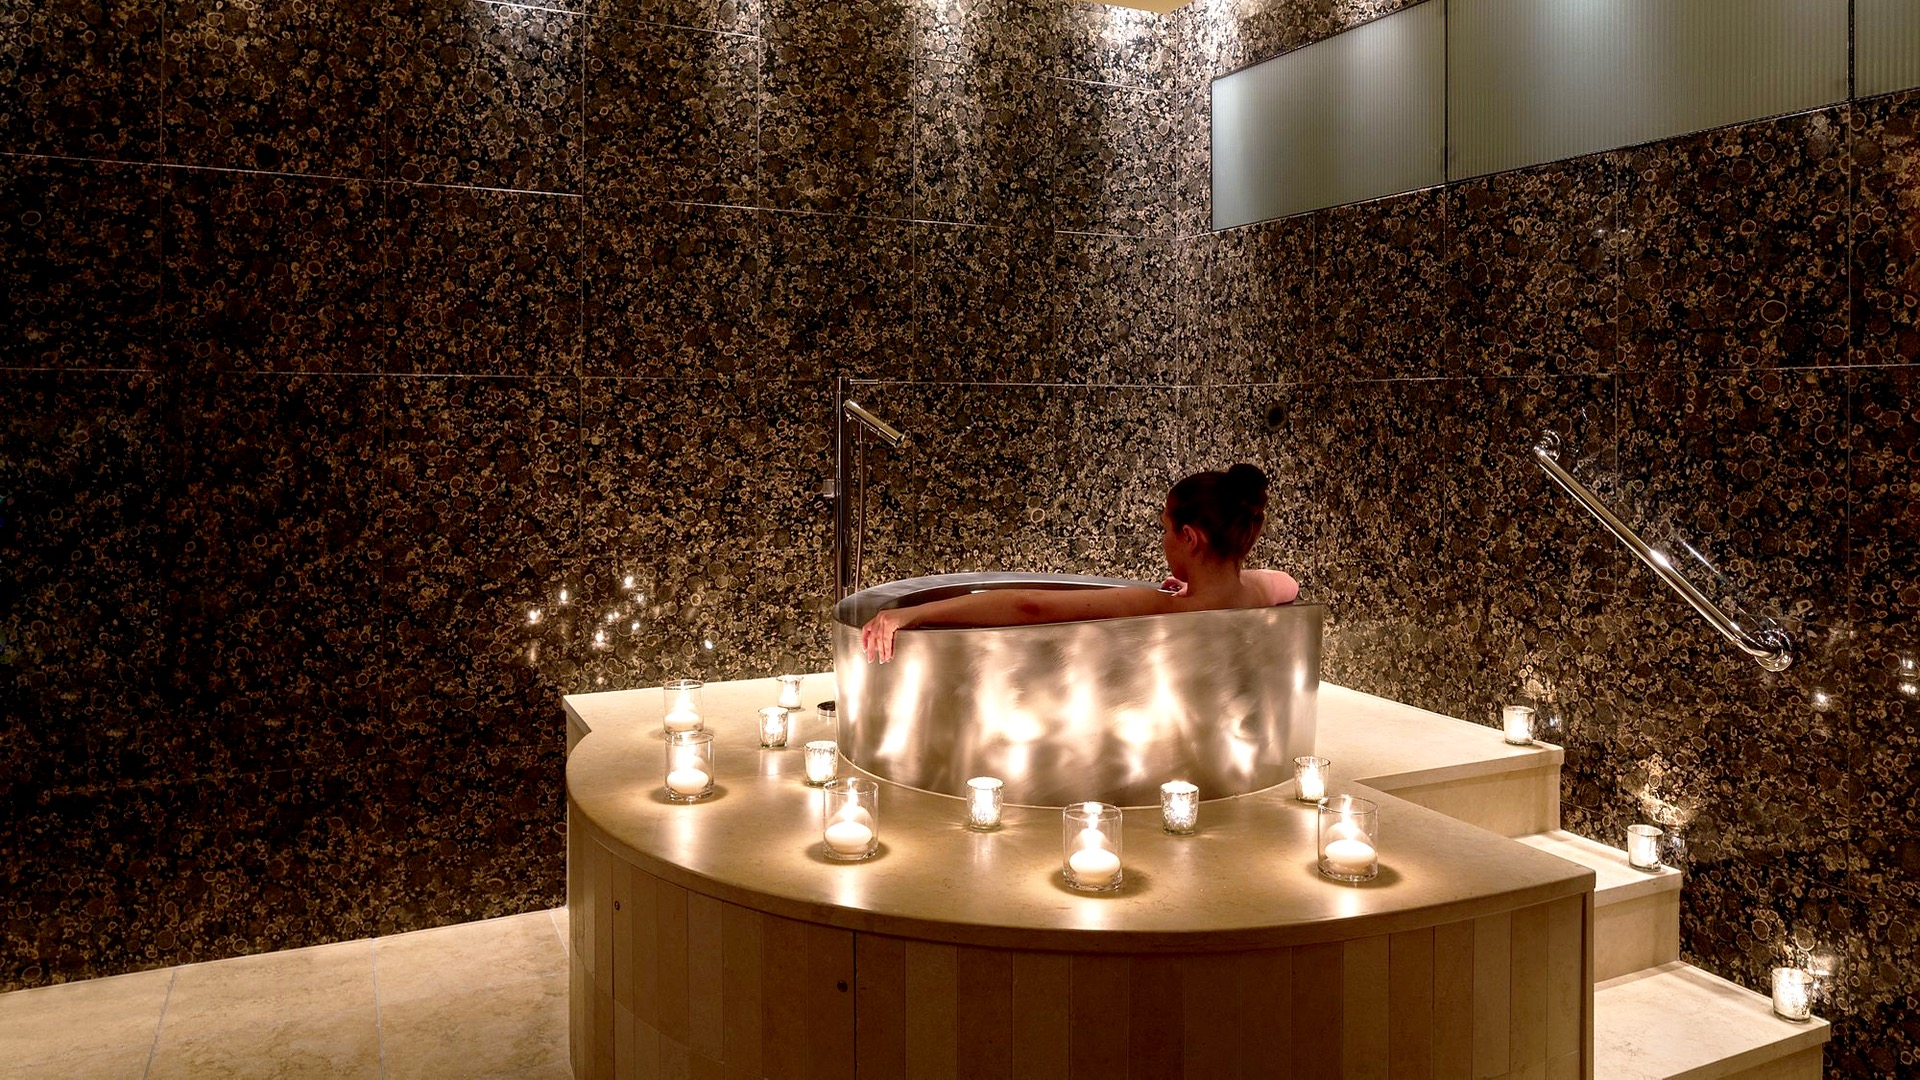 The Ritz Carlton Westchester Spa New York Spas Of America